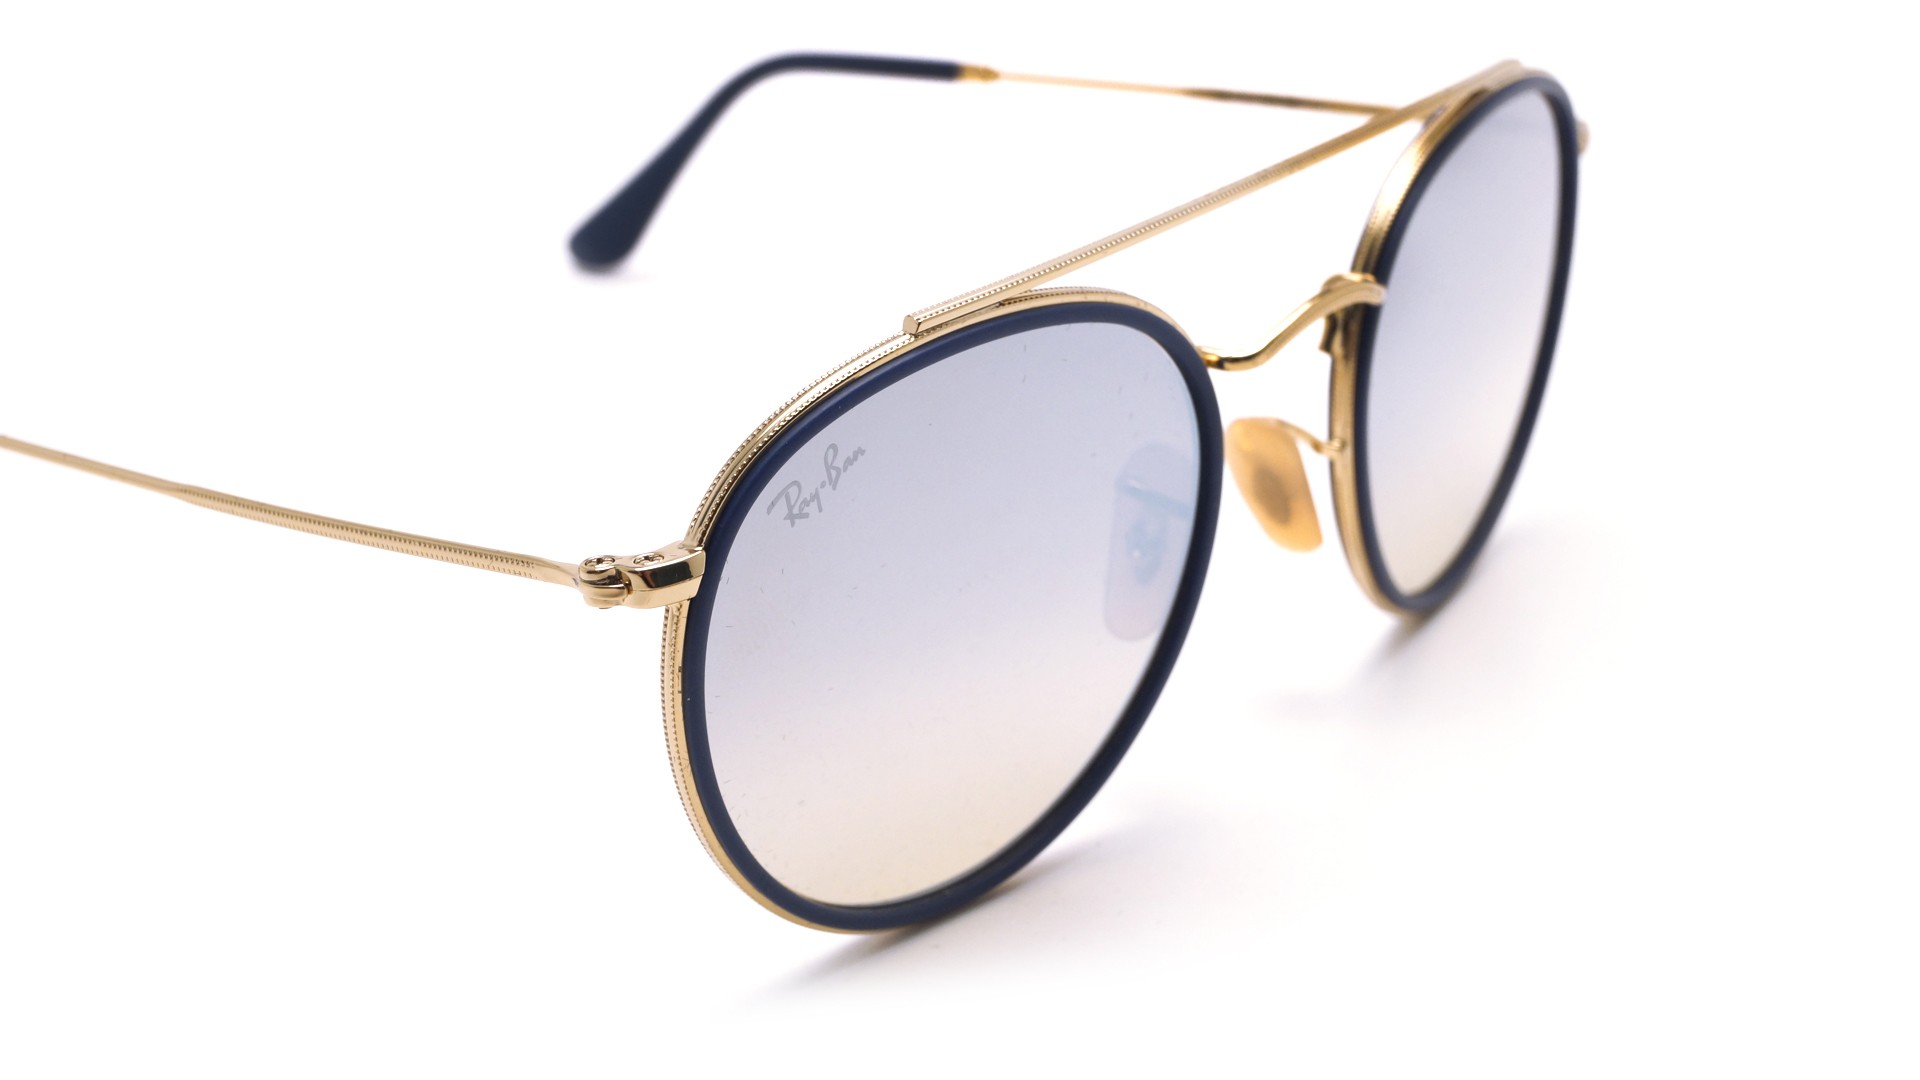 fafc207f28c24 Sunglasses Ray-Ban Round Double Bridge Gold RB3647N 001 9U 51-22 Medium  Gradient Mirror